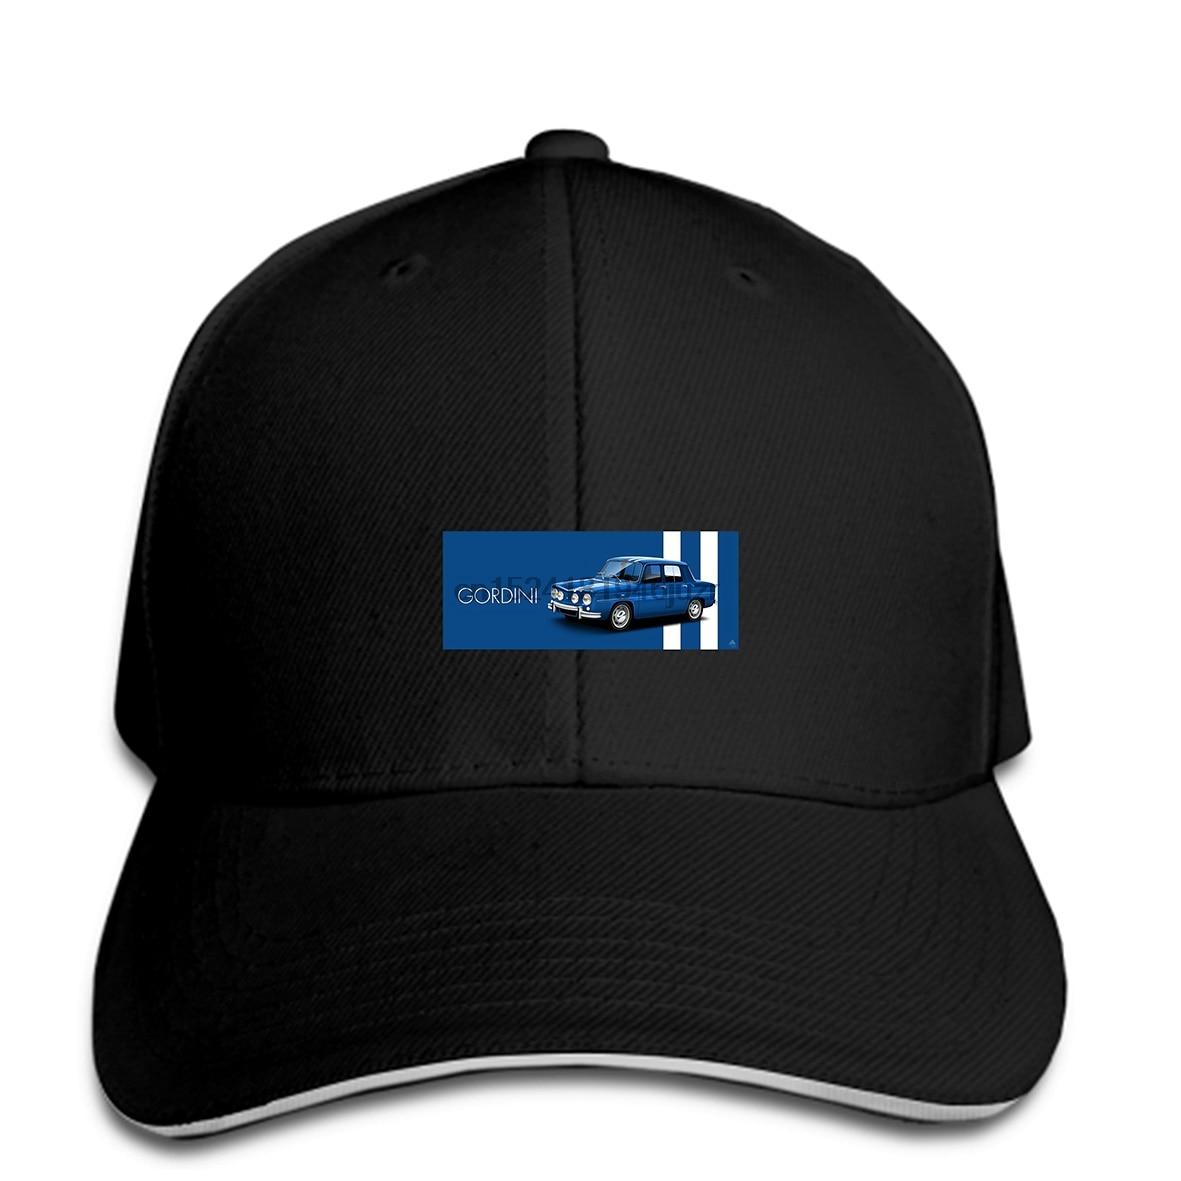 Gorras de béisbol de hip hop gorra impresa personalizada gorra de coche clásico arte de coches Renault 8 Gordini gorra snapback de mujer